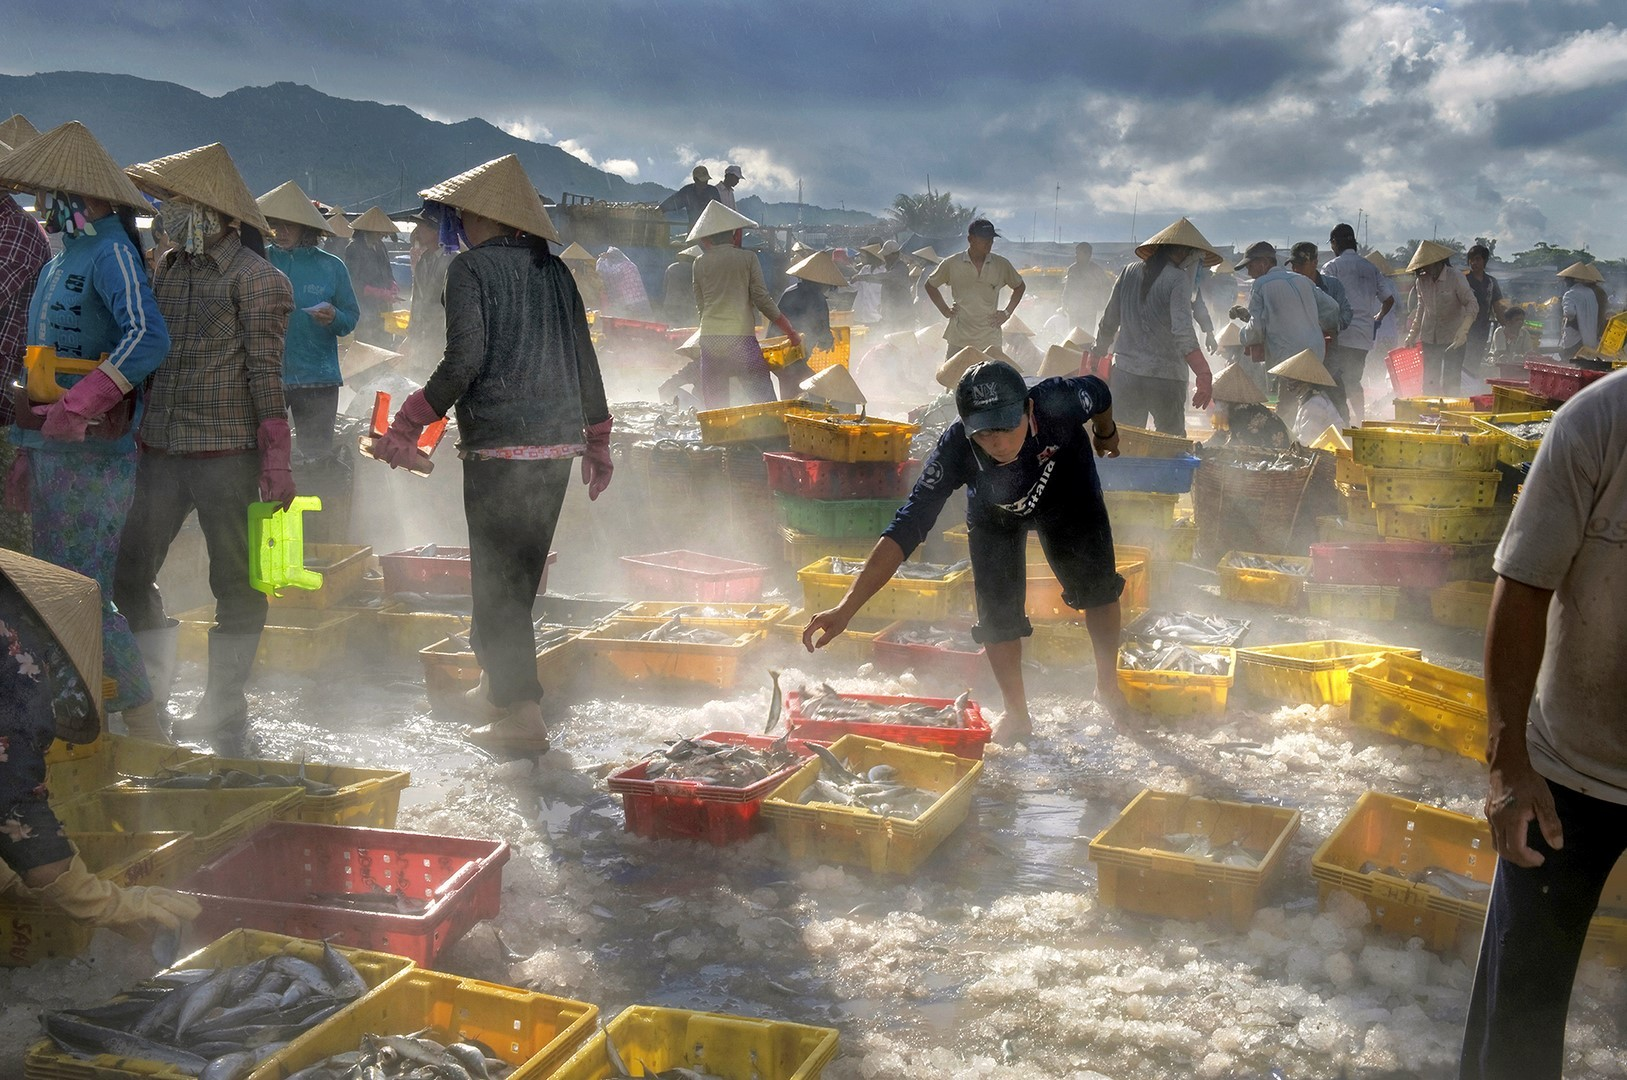 Fish market hoang trung thuy copier